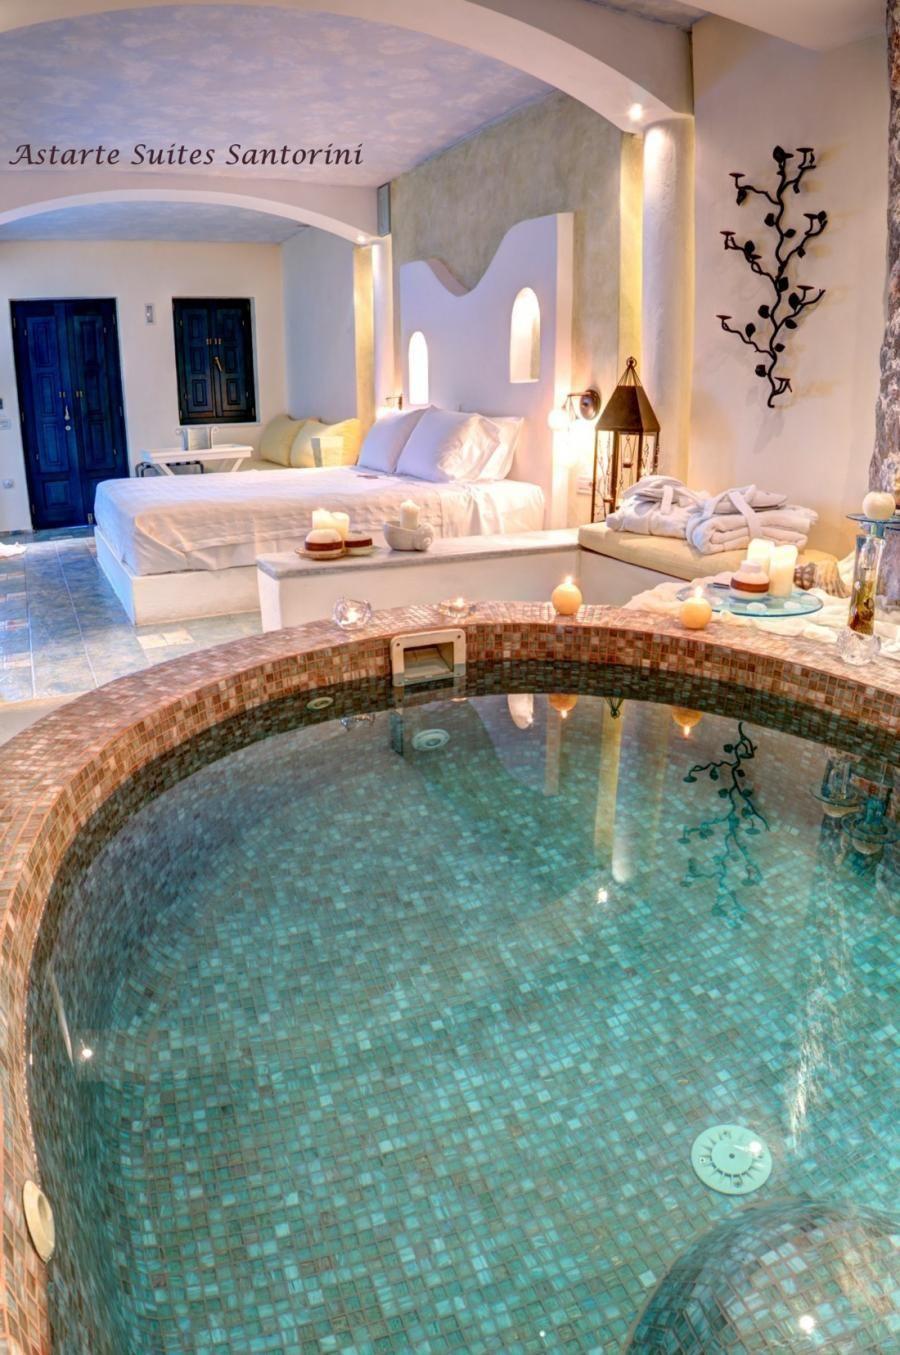 Honeymoon Suite With Private Jacuzzi Astarte Suites Hotel In Santorini Island Greece Honeymoon Suite Hotel Santorini Hotels